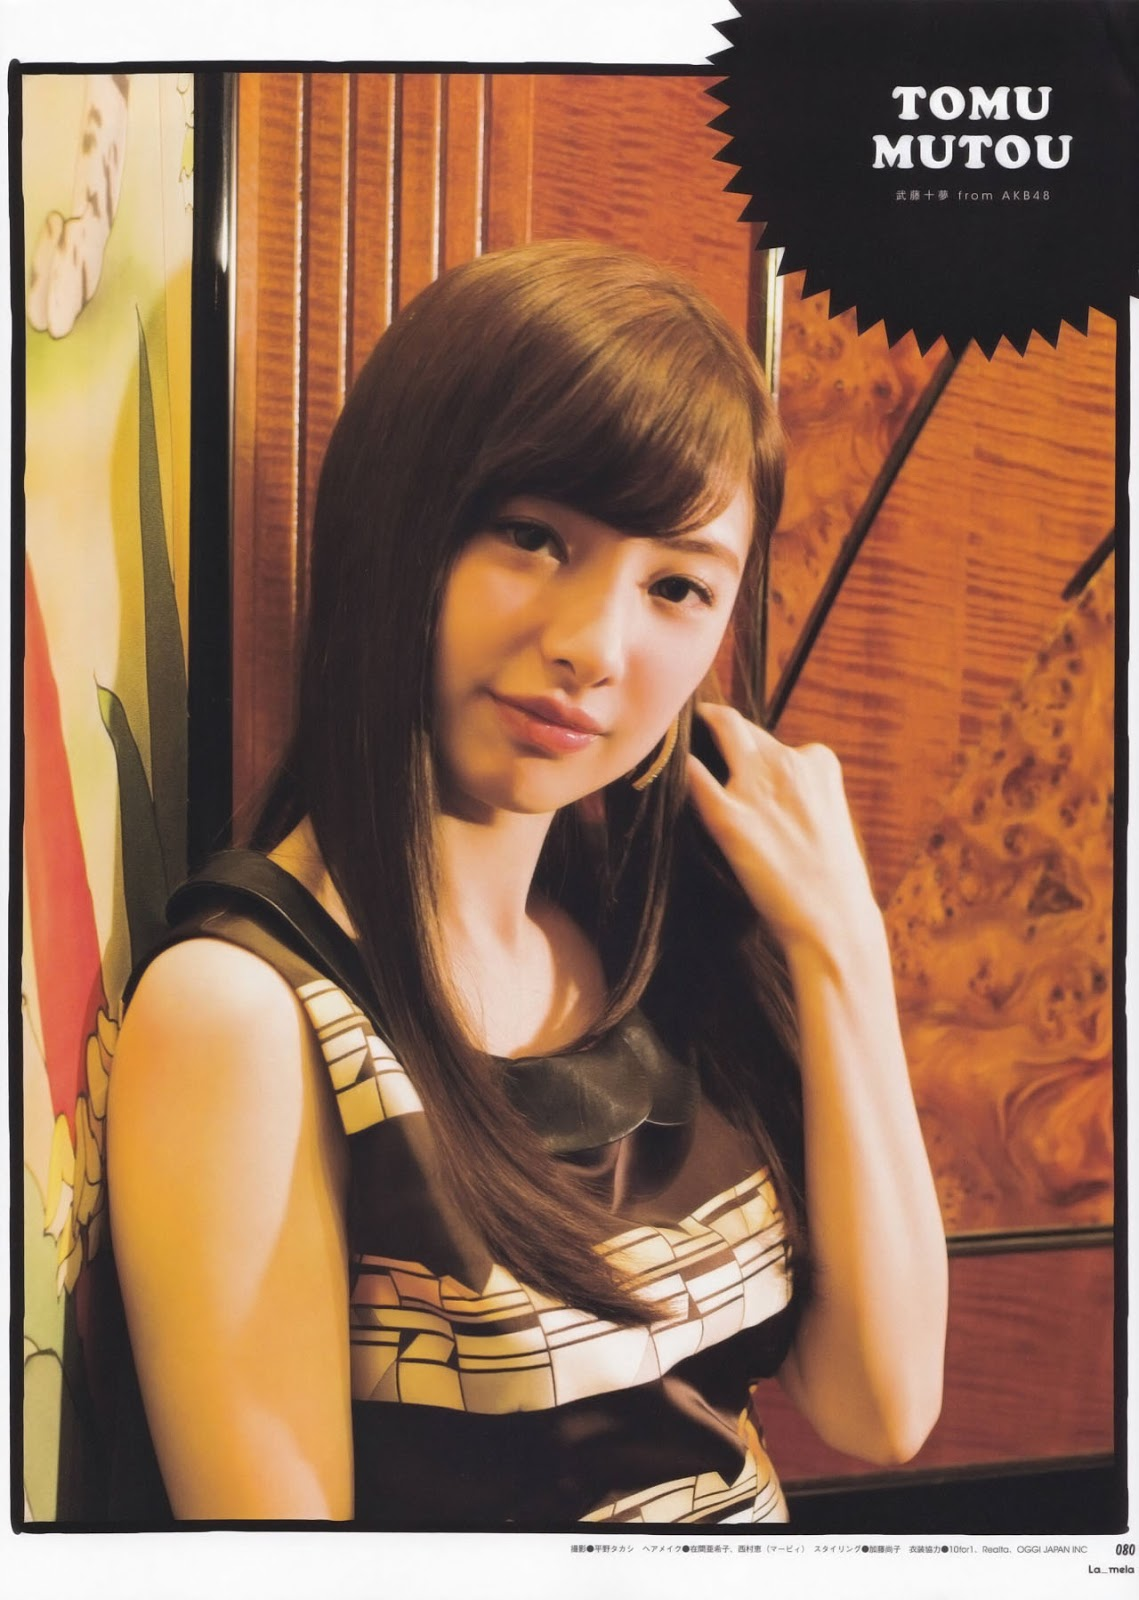 Muto Tomu 武藤十夢 AKB48, My Girl 2016 Vol.11 Gravure